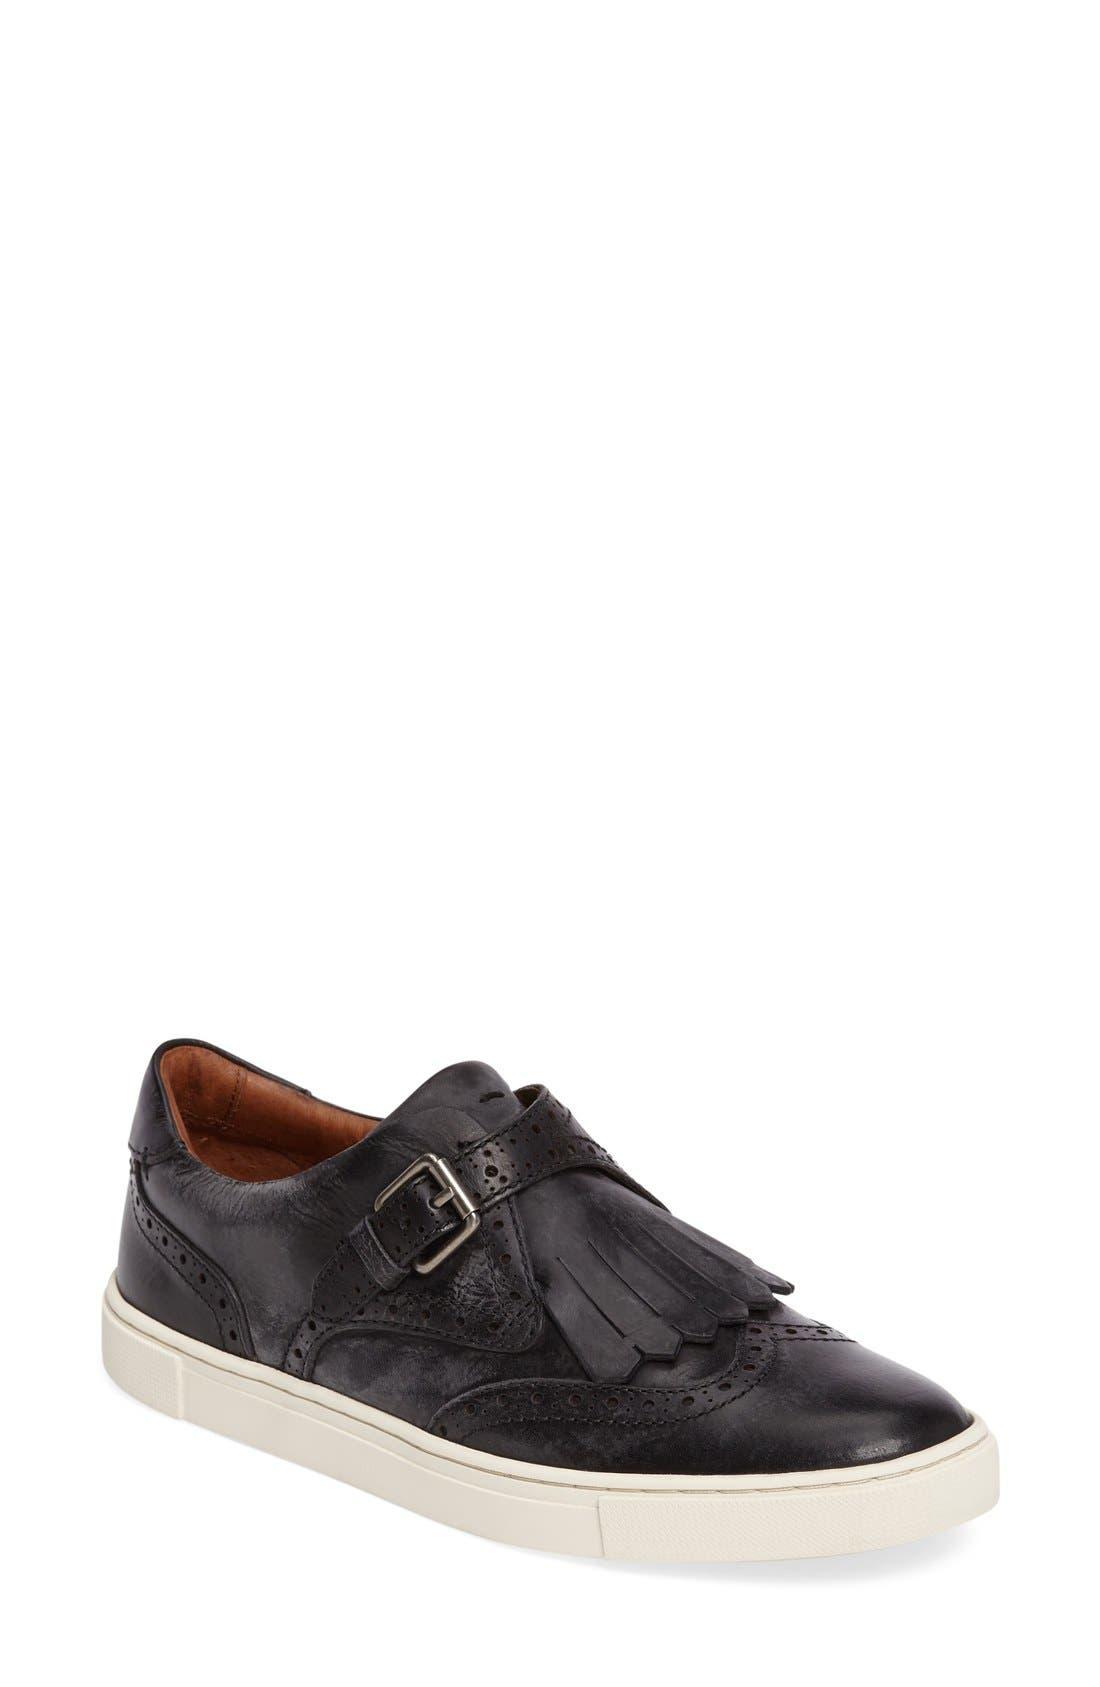 'Gemma' Kiltie Slip On-Sneaker,                         Main,                         color,